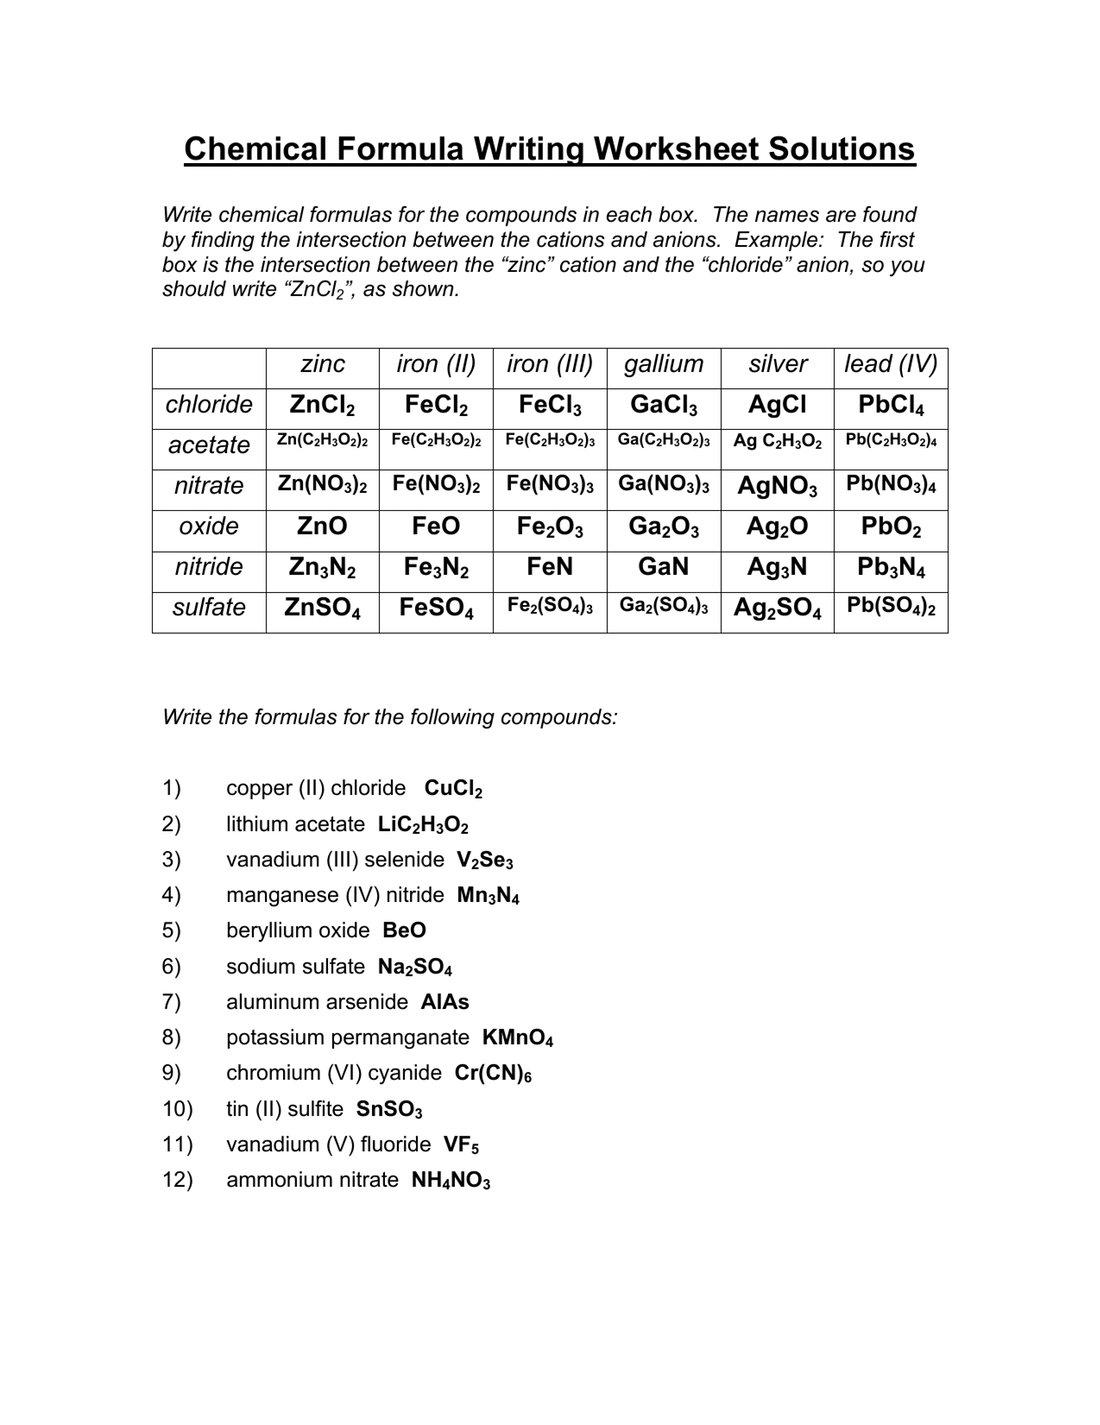 Worksheet Chemical Formula Writing Worksheet Chemical Formula With Chemical Formula Writing Worksheet Answers